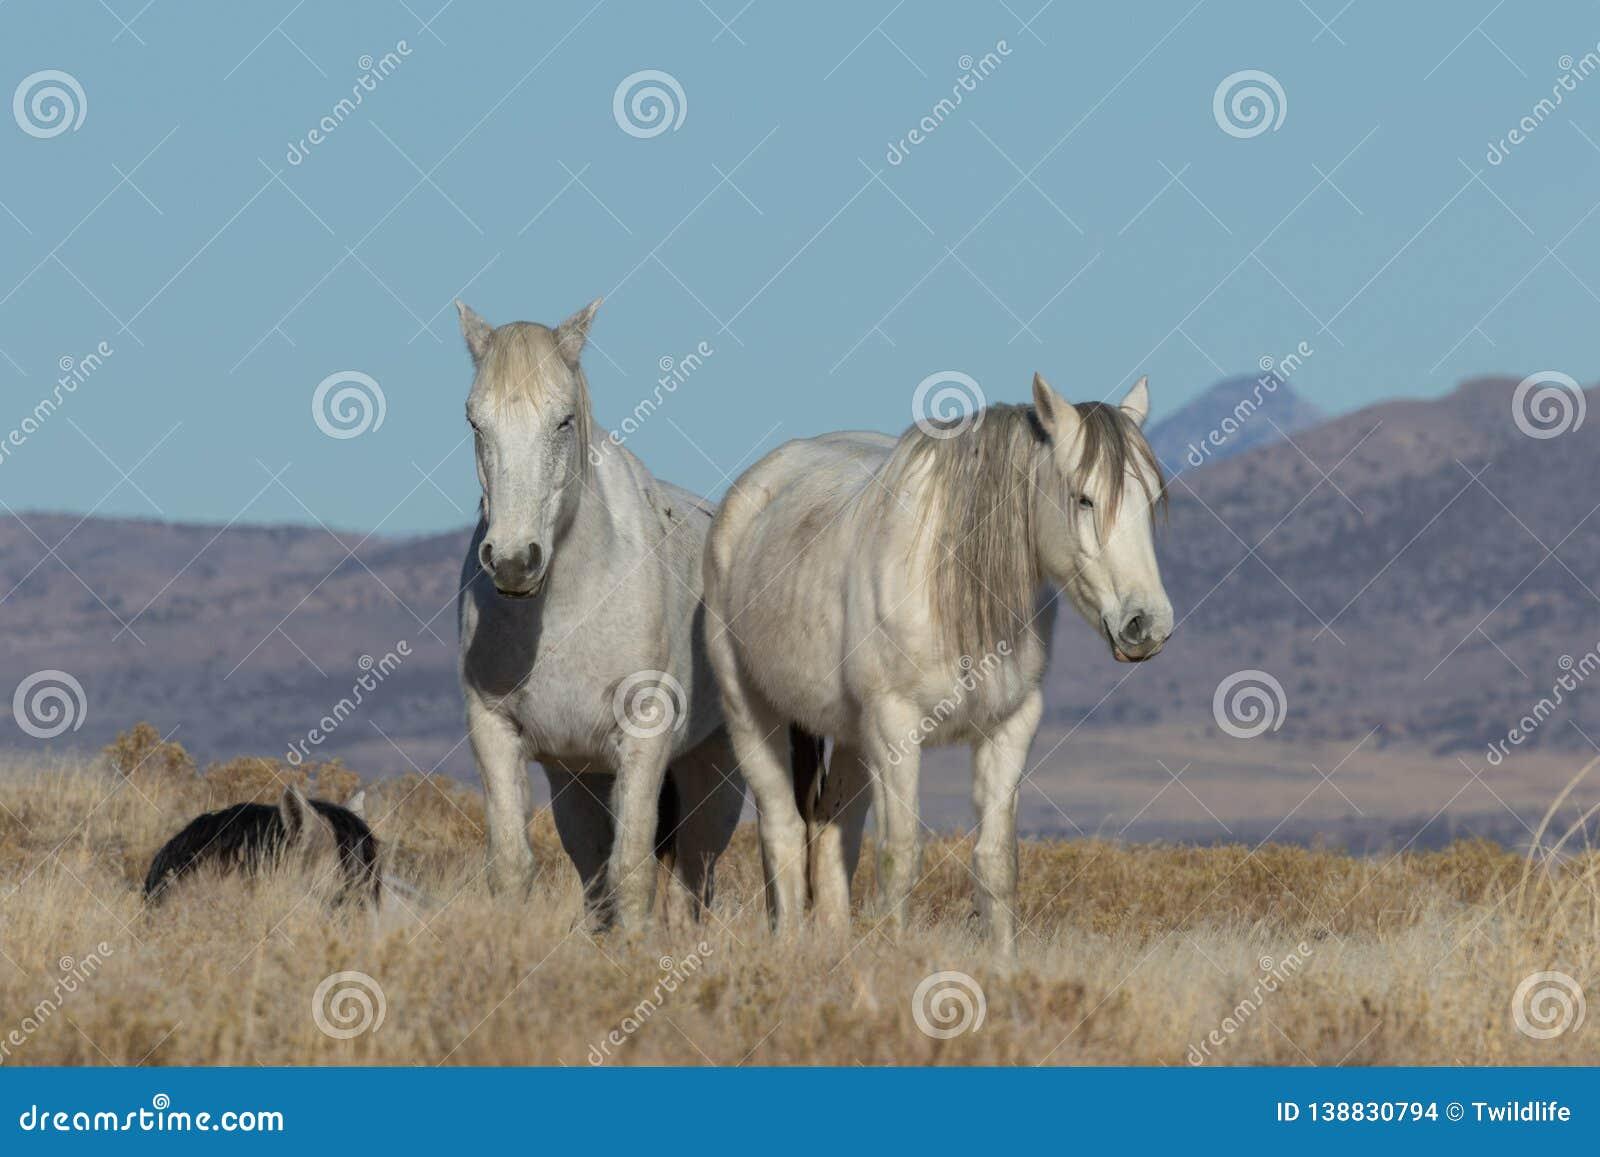 Beautiful Wild Horses In The Utah Desert In Winter Stock Photo Image Of Horse Winter 138830794